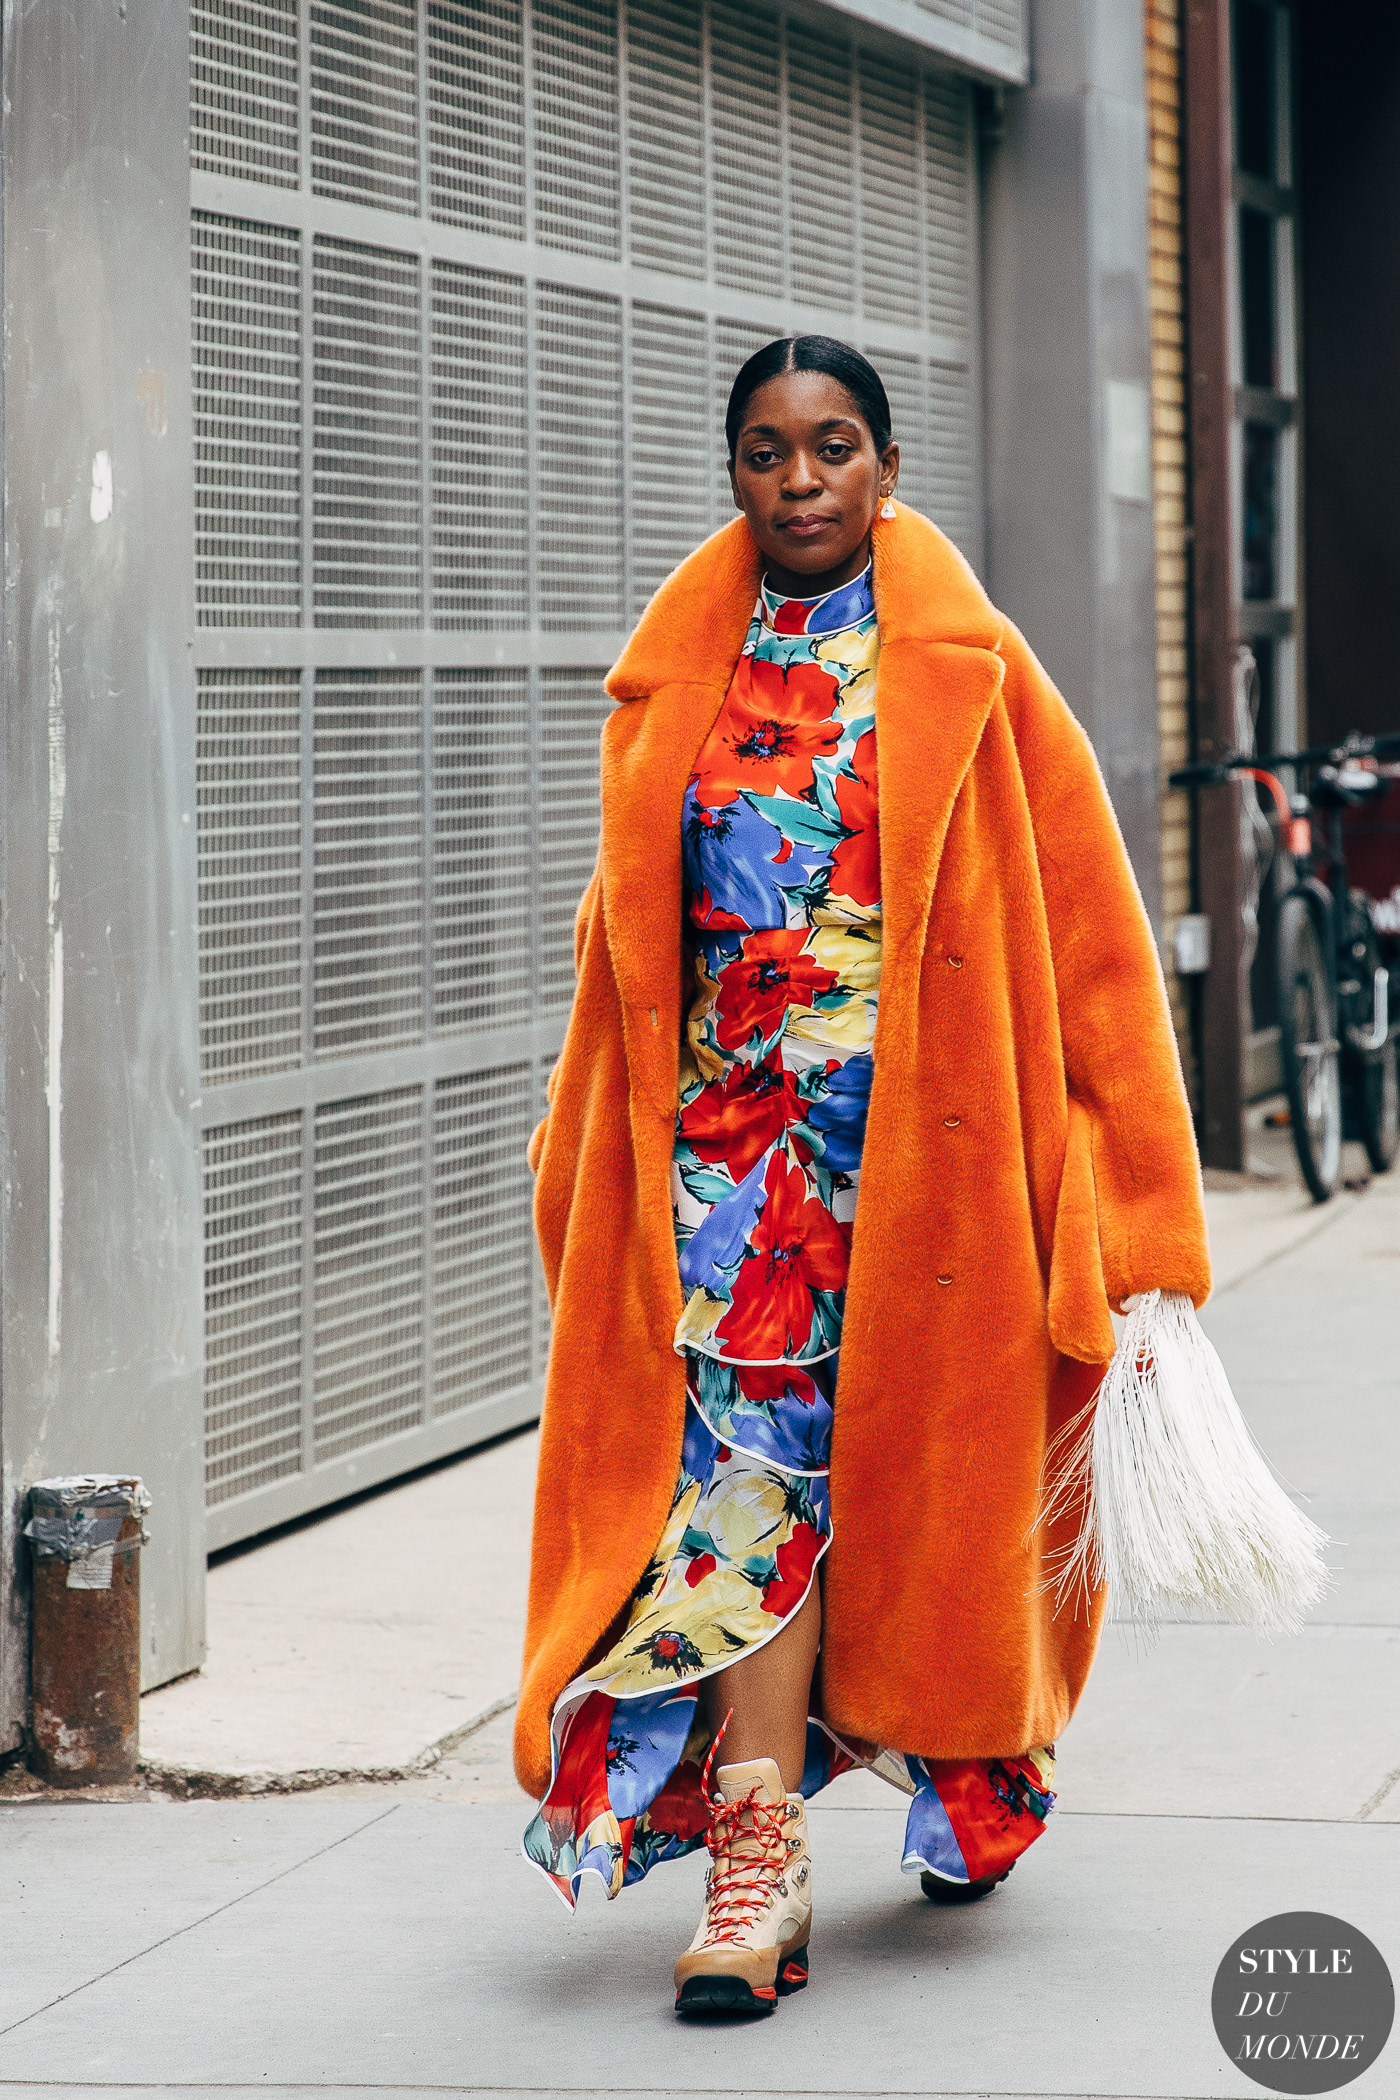 New York FW 2019 Street Style: Tamu McPherson - STYLE DU